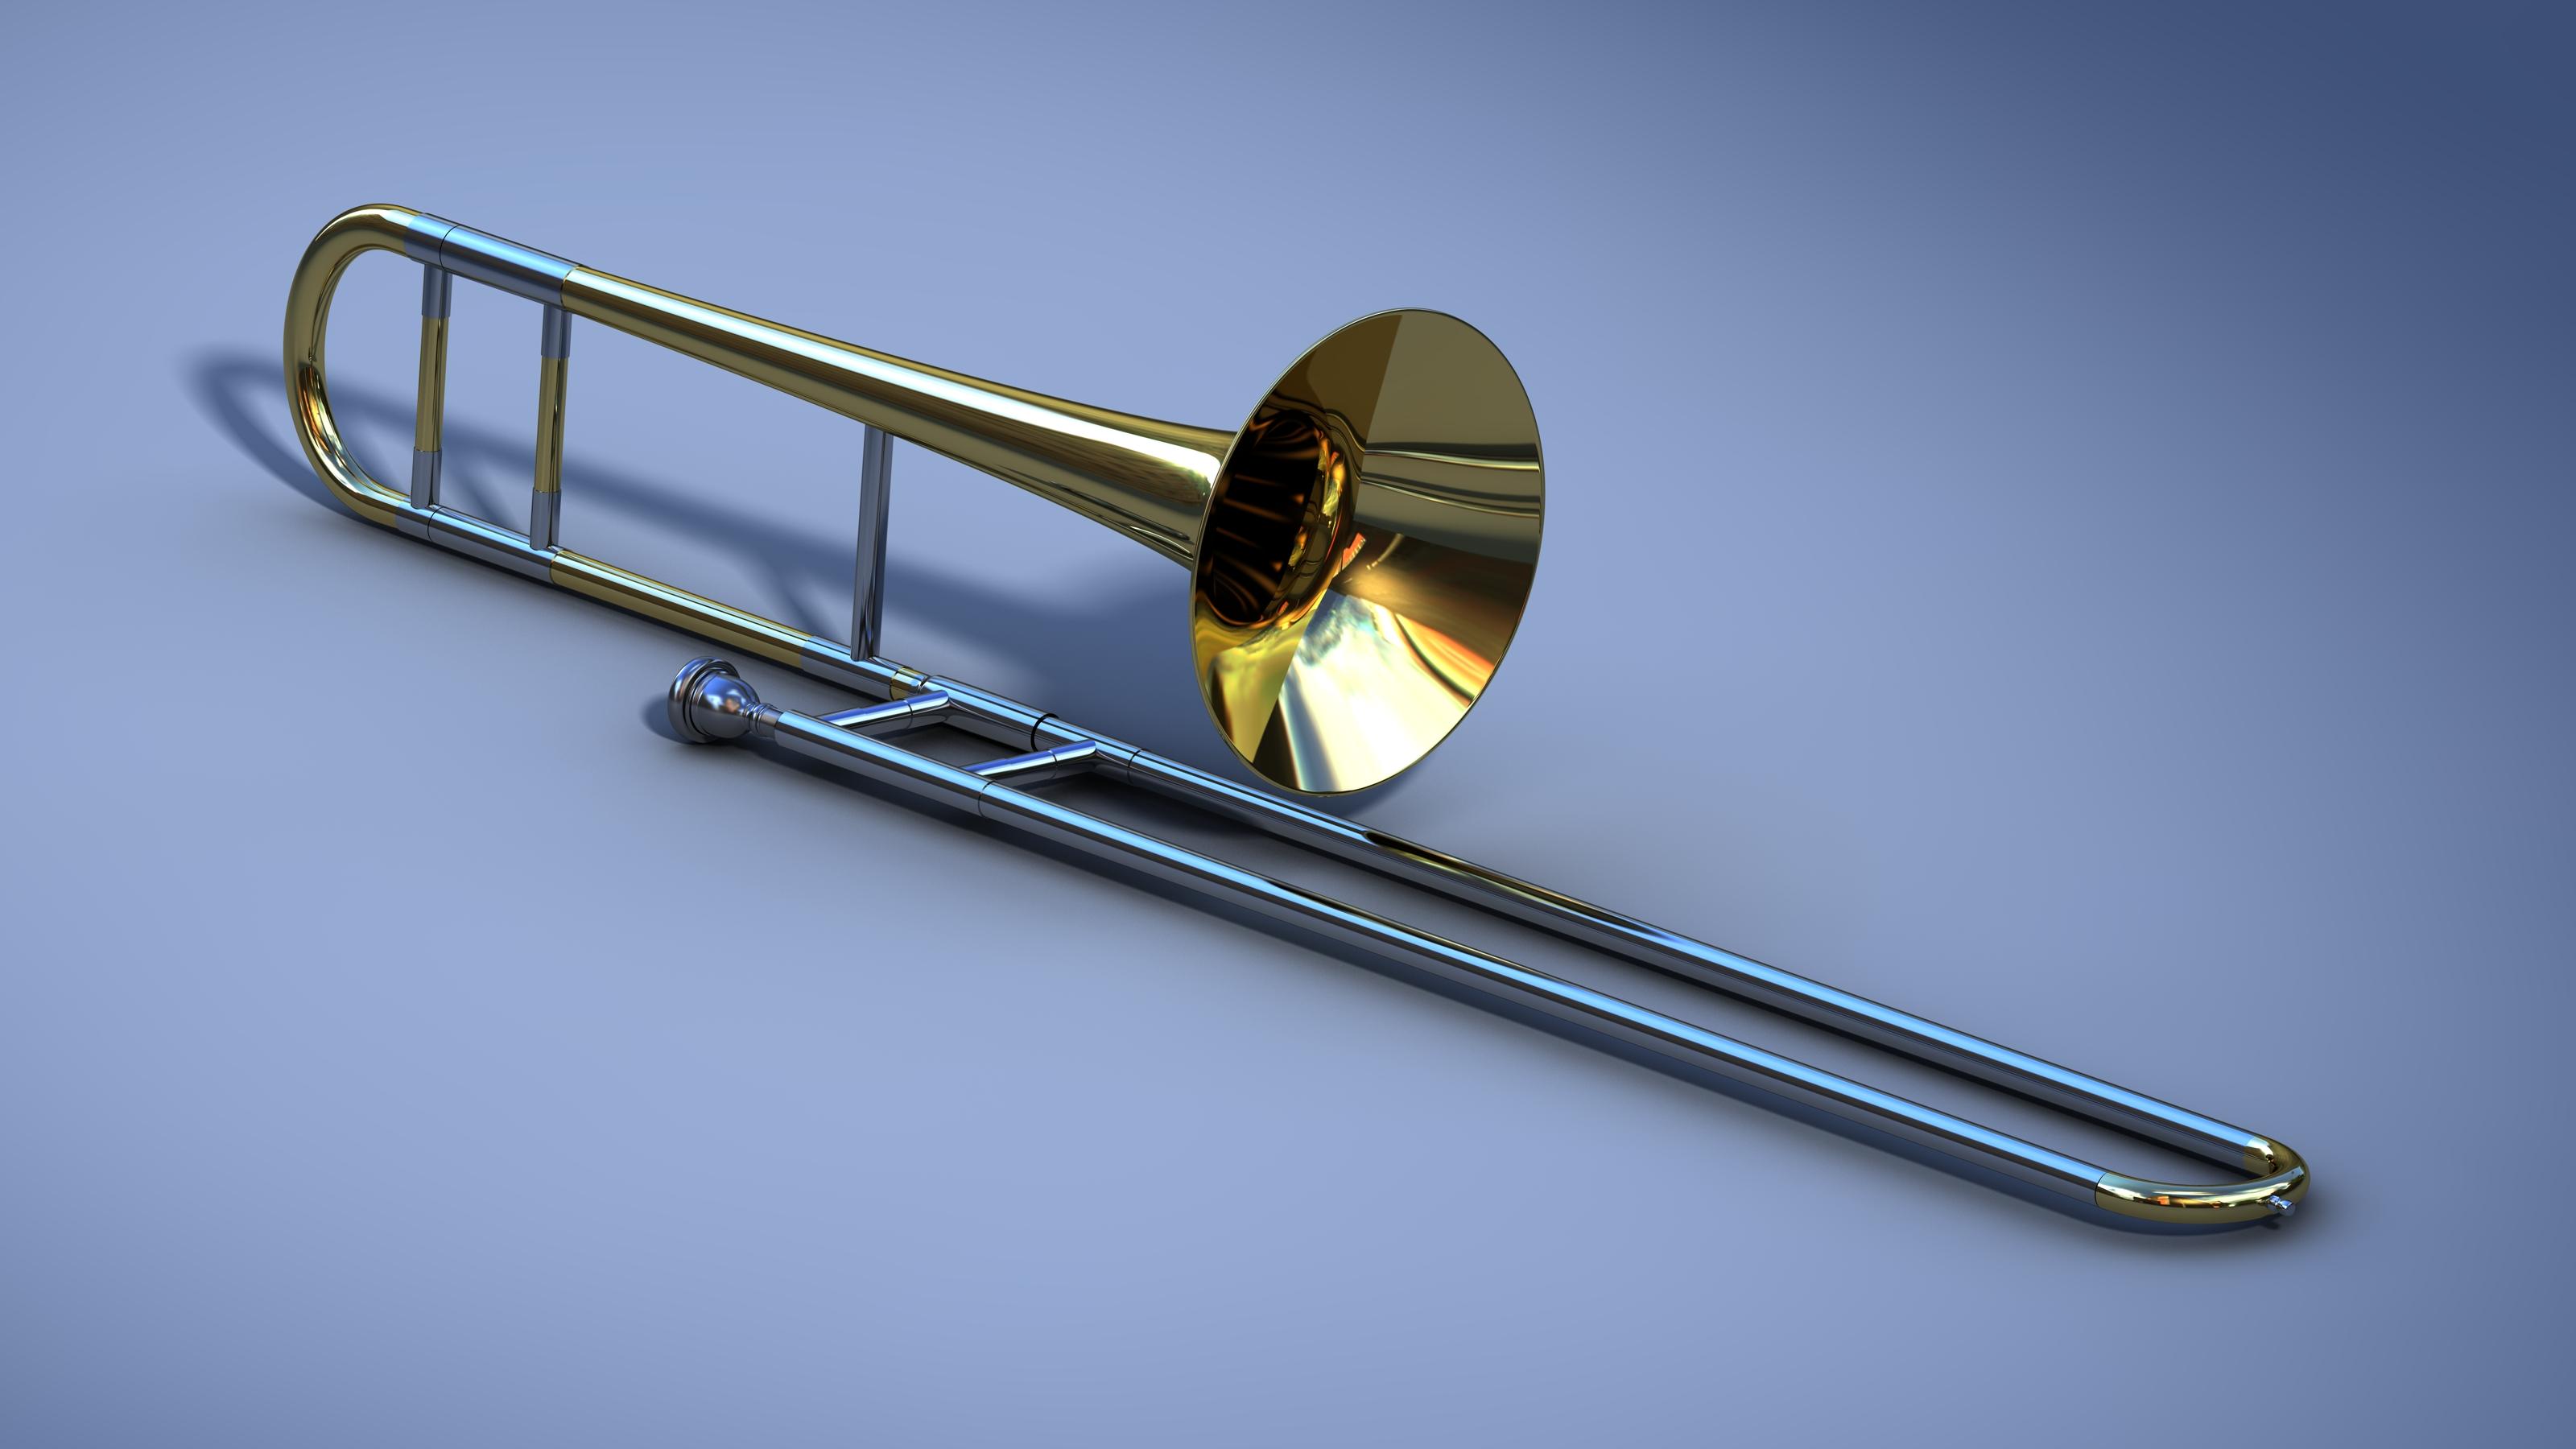 Trombone - Simple English Wikipedia, the free encyclopedia